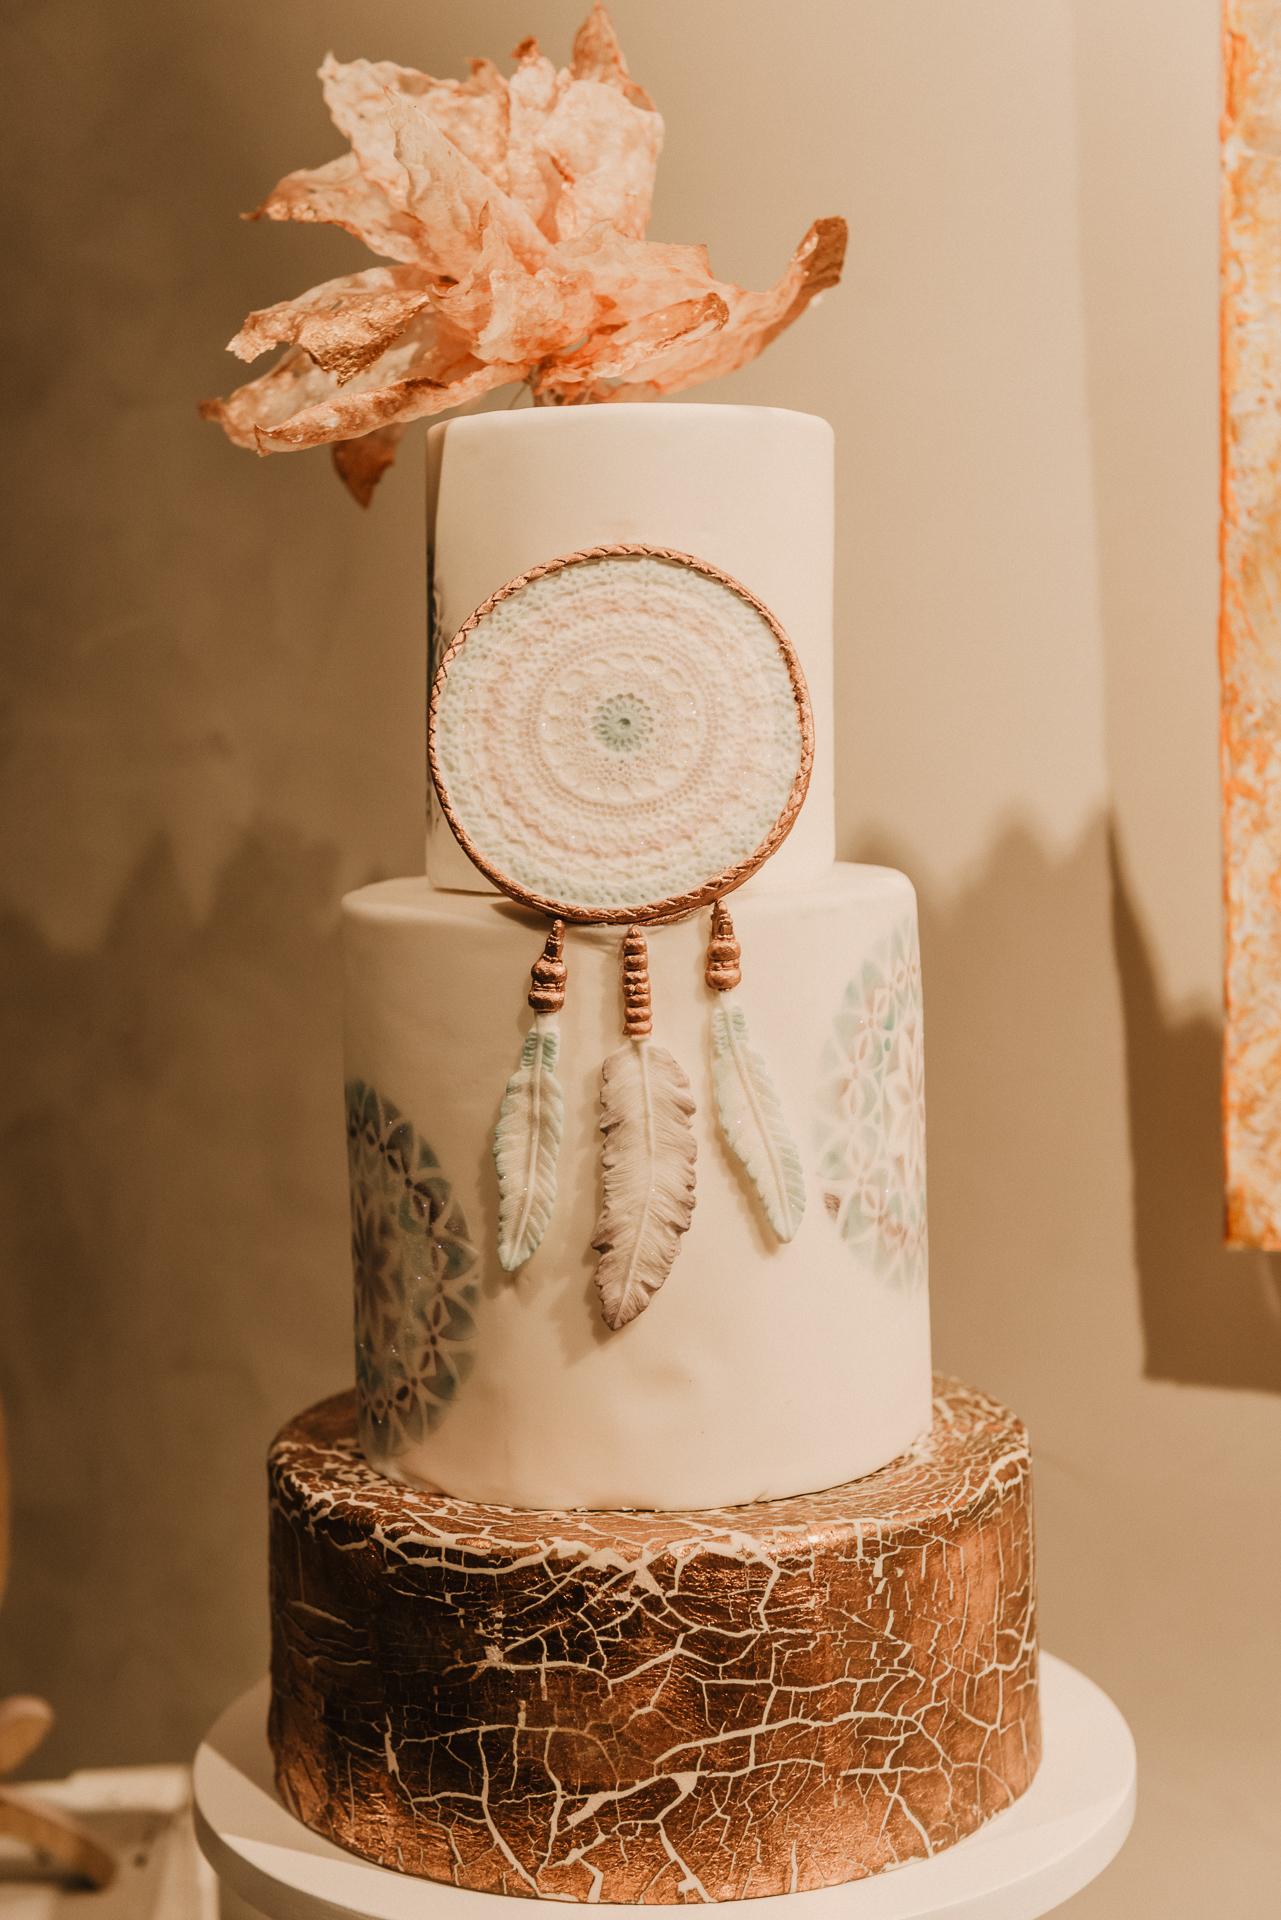 Zweinander-LeonoreHerzog-WeddingMarket-OnTour20191110-9758